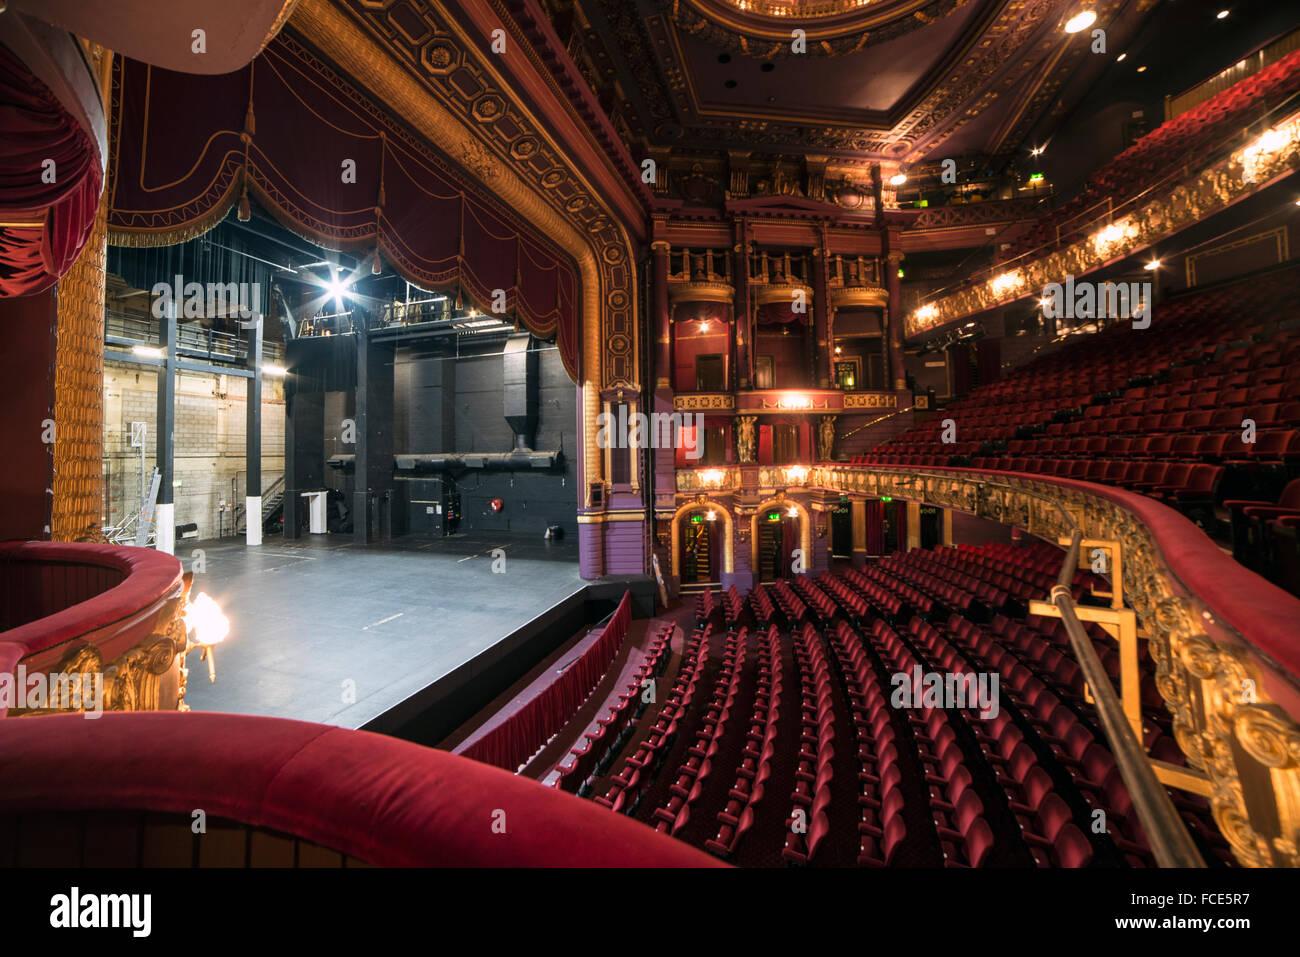 Das Palace Theatre-Manchester Stockbild